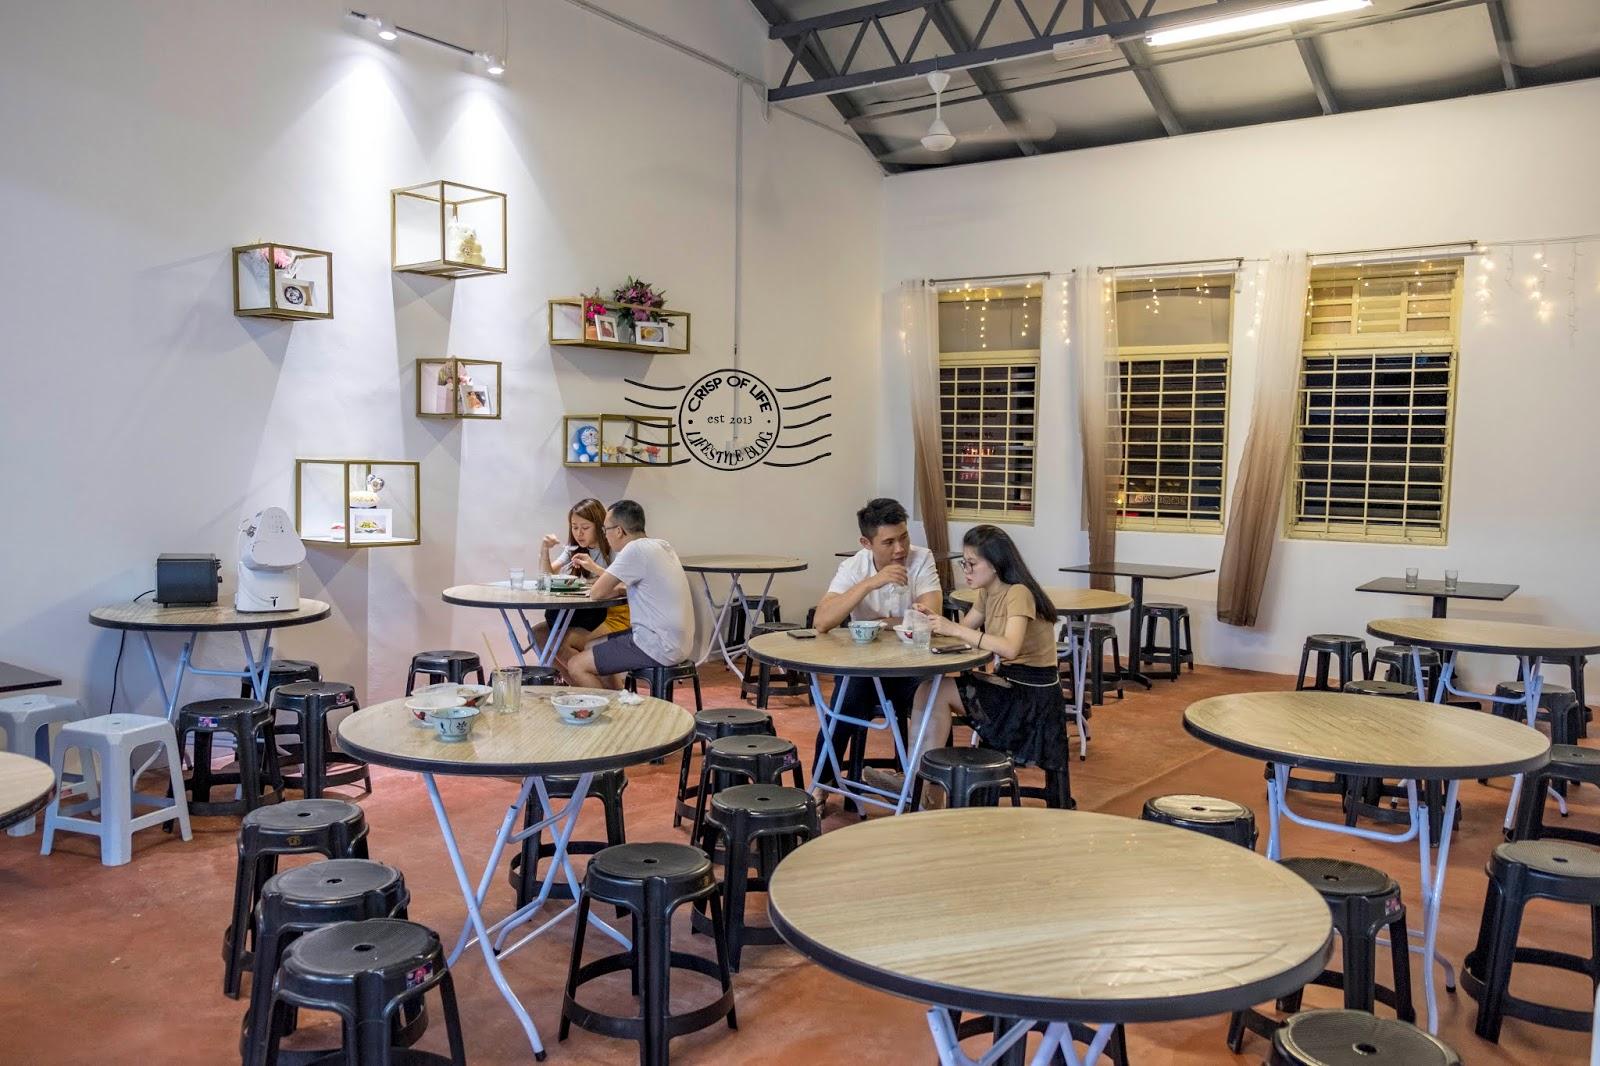 Shan Jie Dessert House 姗姐甜品屋 @ Siam Road, Penang